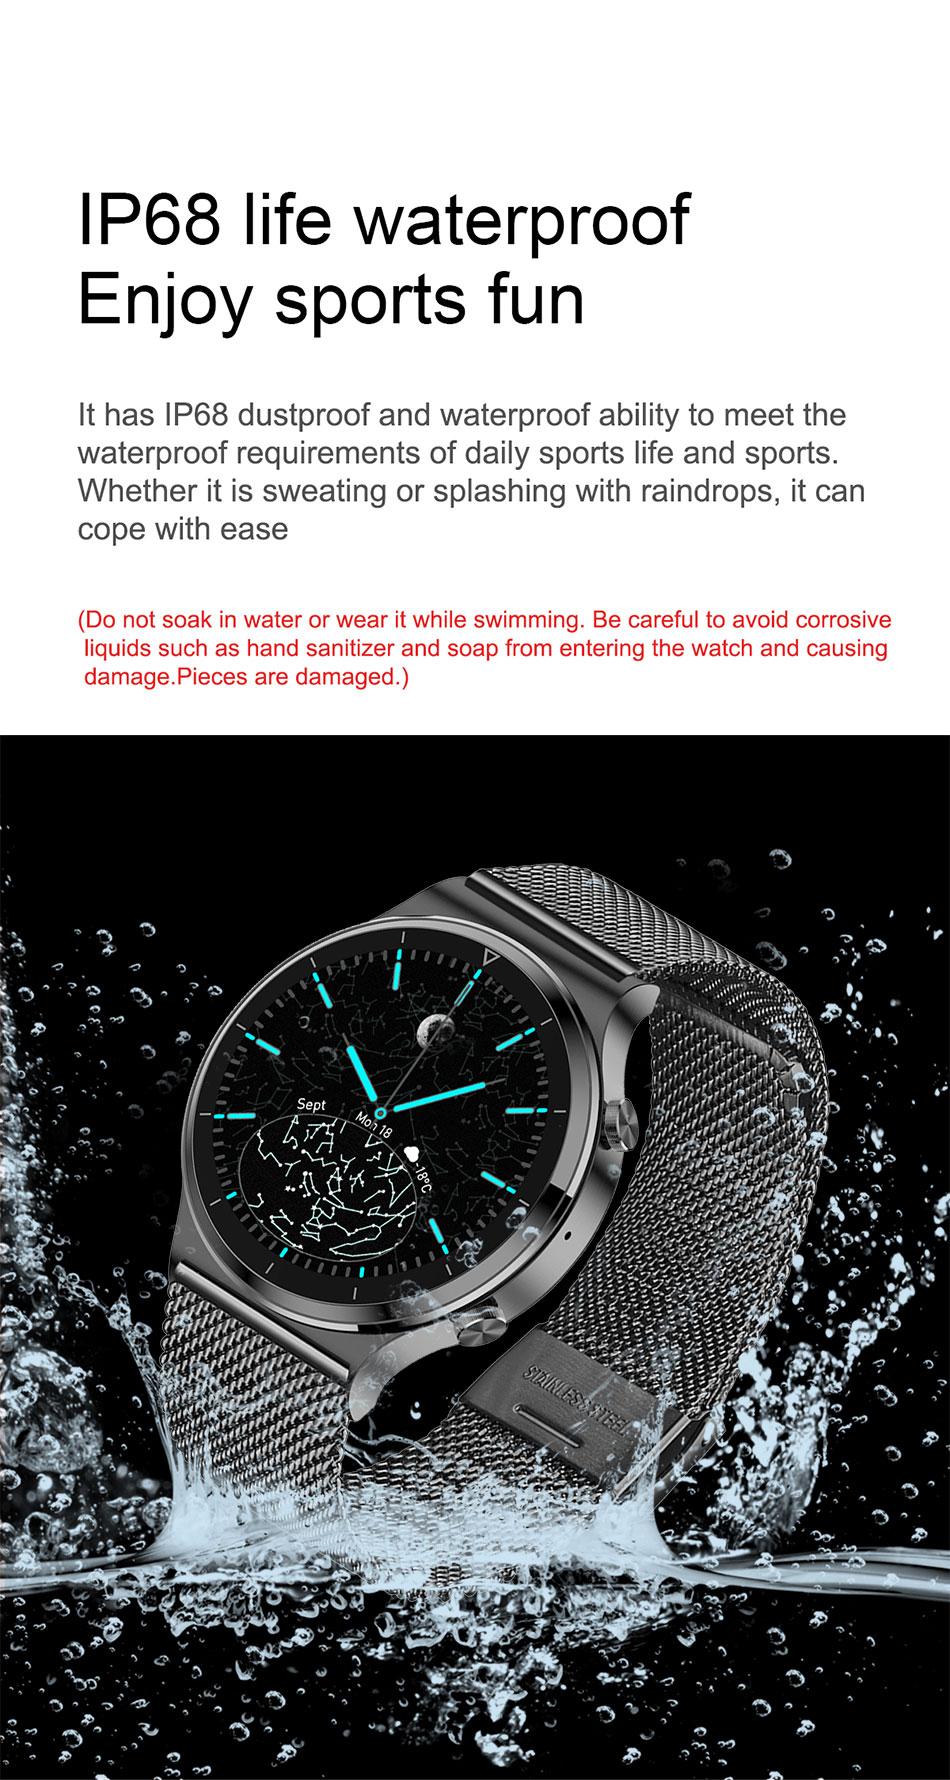 Hdf7bc6e44e4e4b6cbc0e054ad9fd9551d LIGE 2021 New Smart watch Men IP68 waterproof watch Multiple sports modes heart rate weather Forecast Bluetooth Men Smart watch